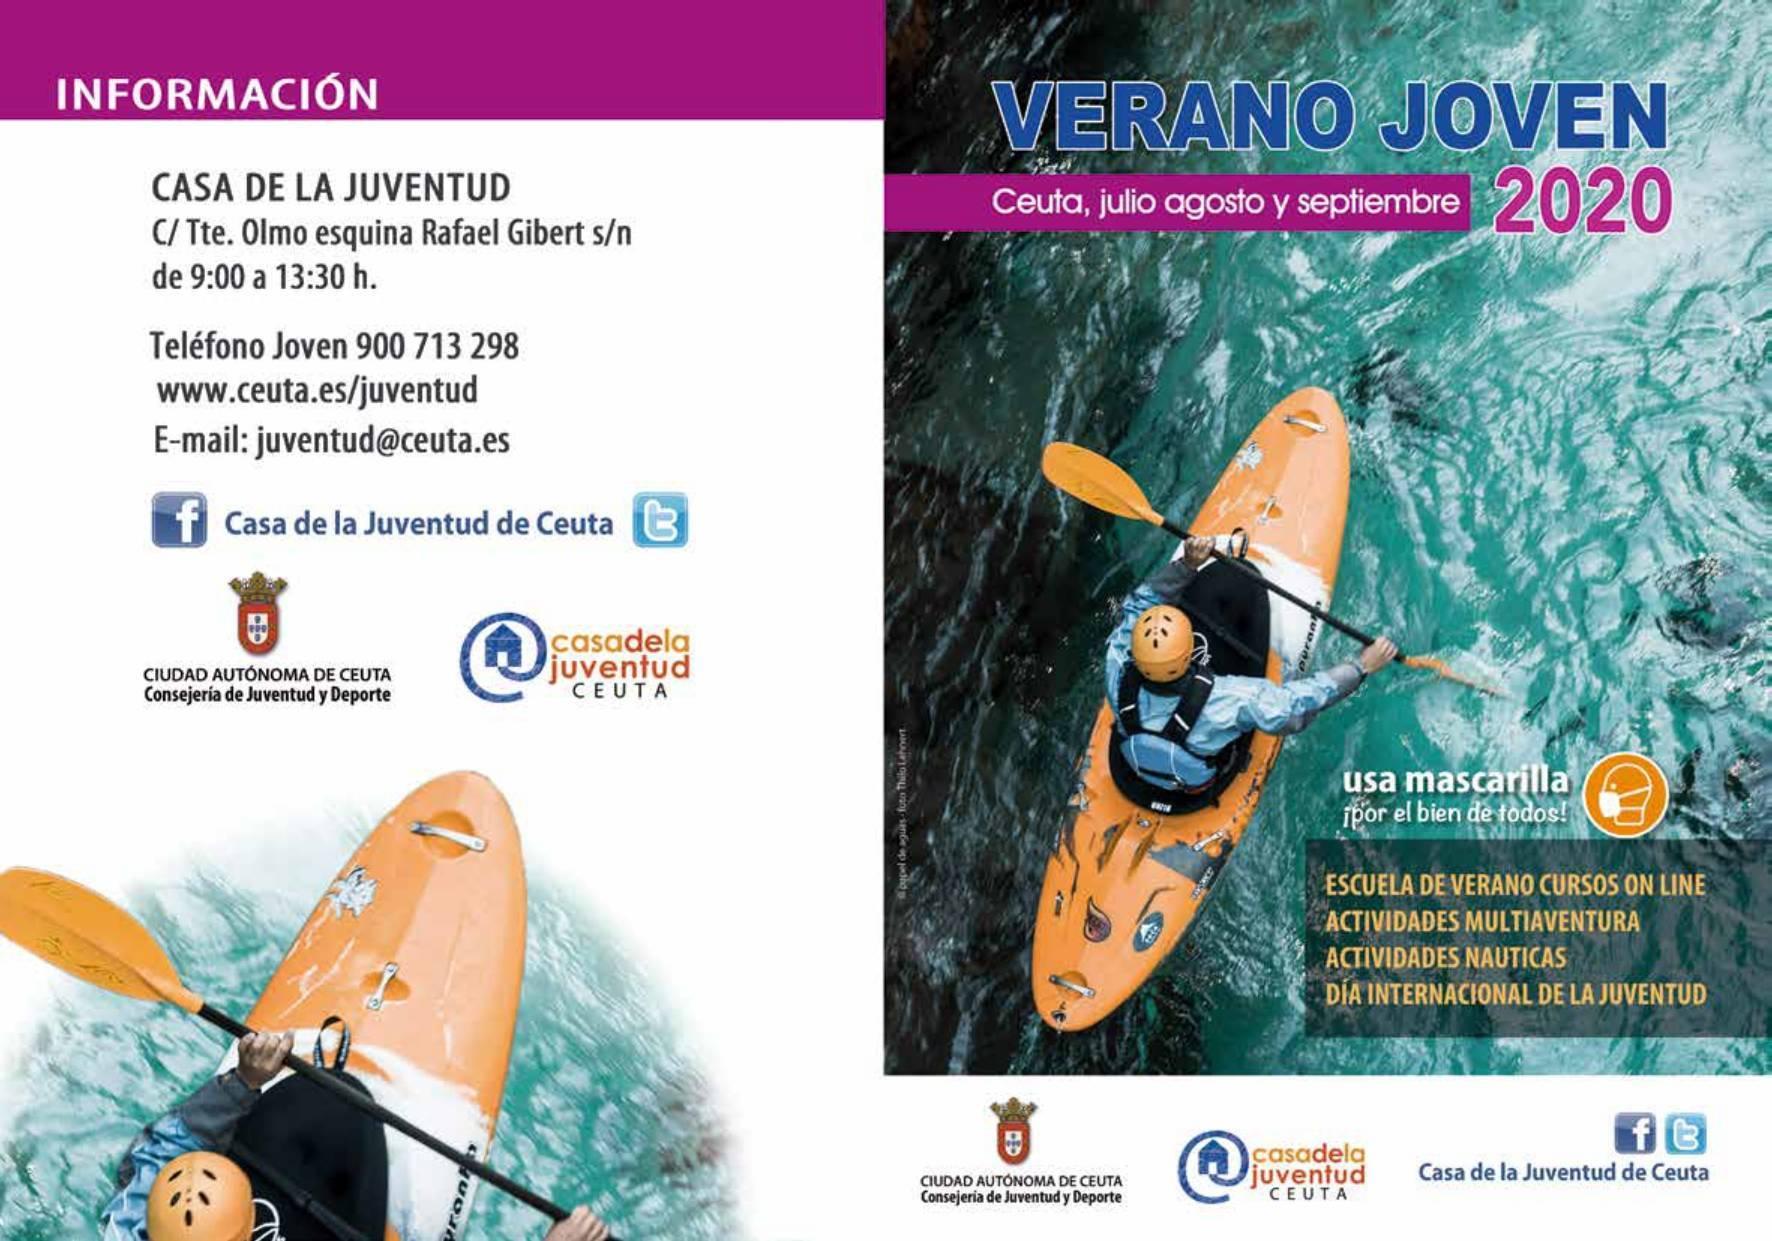 Programa verano joven 2020 - Ceuta 1